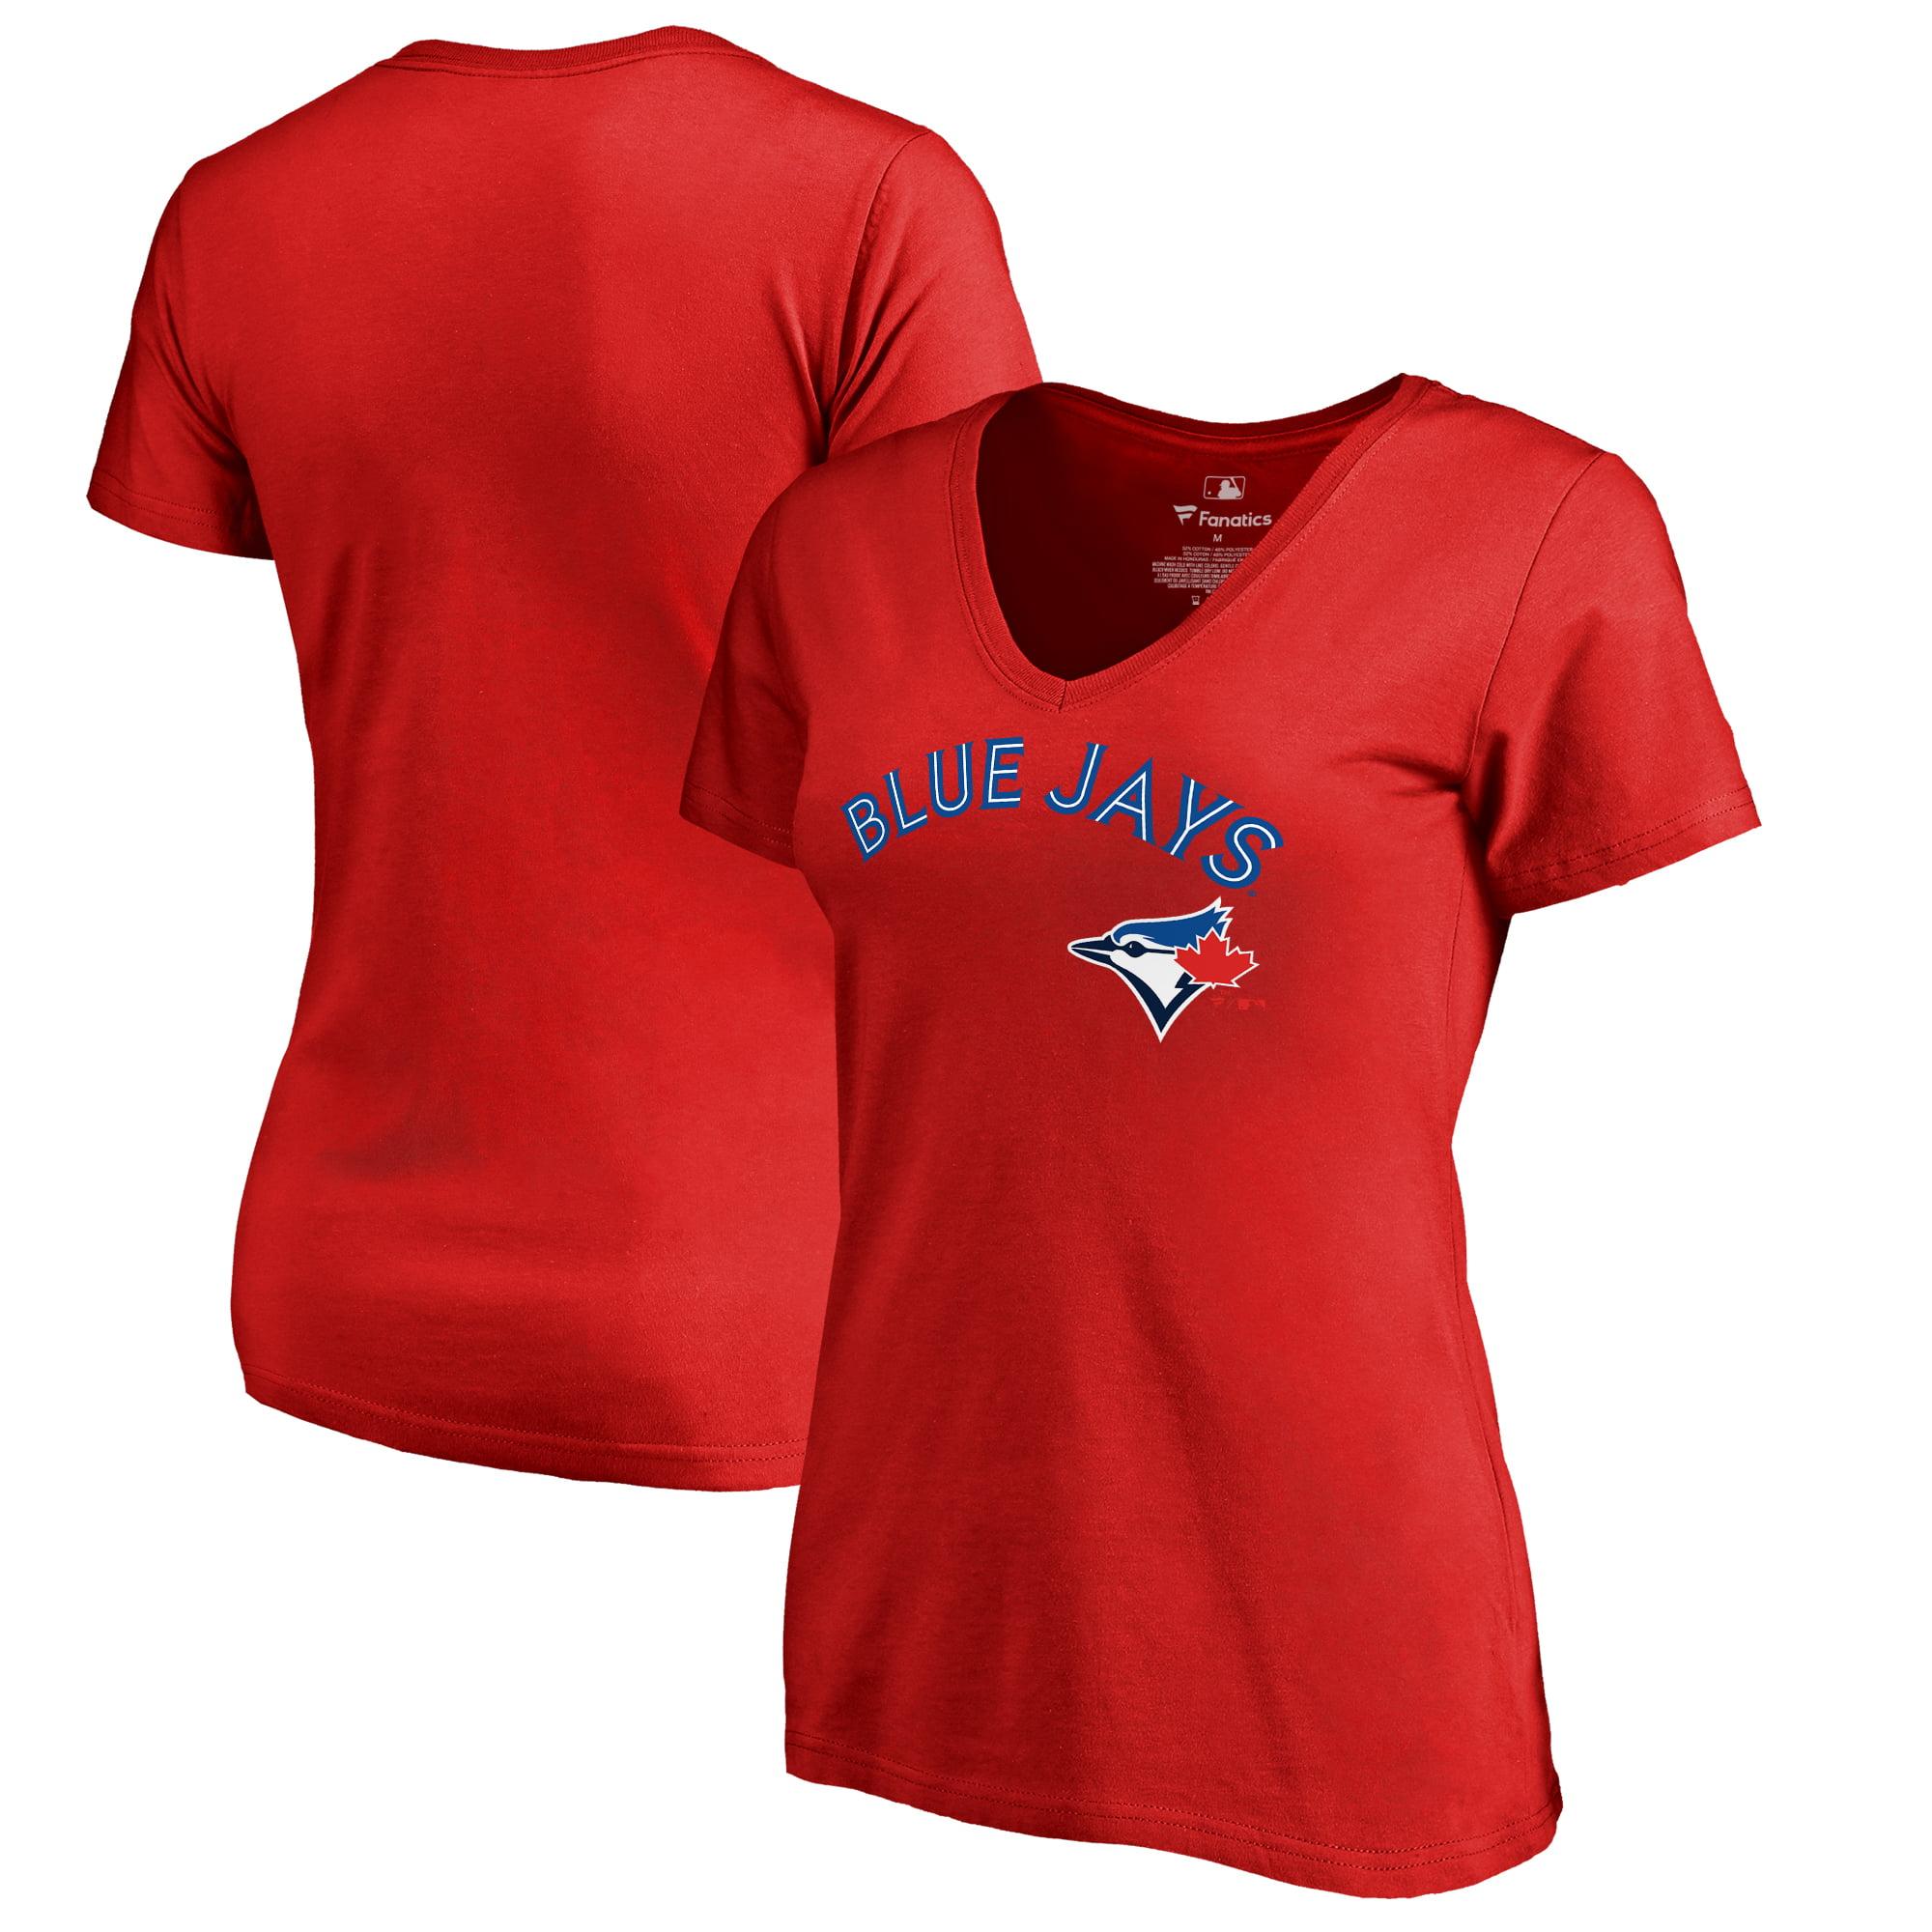 Toronto Blue Jays Fanatics Branded Women's Plus Sizes Team Lockup T-Shirt - Red